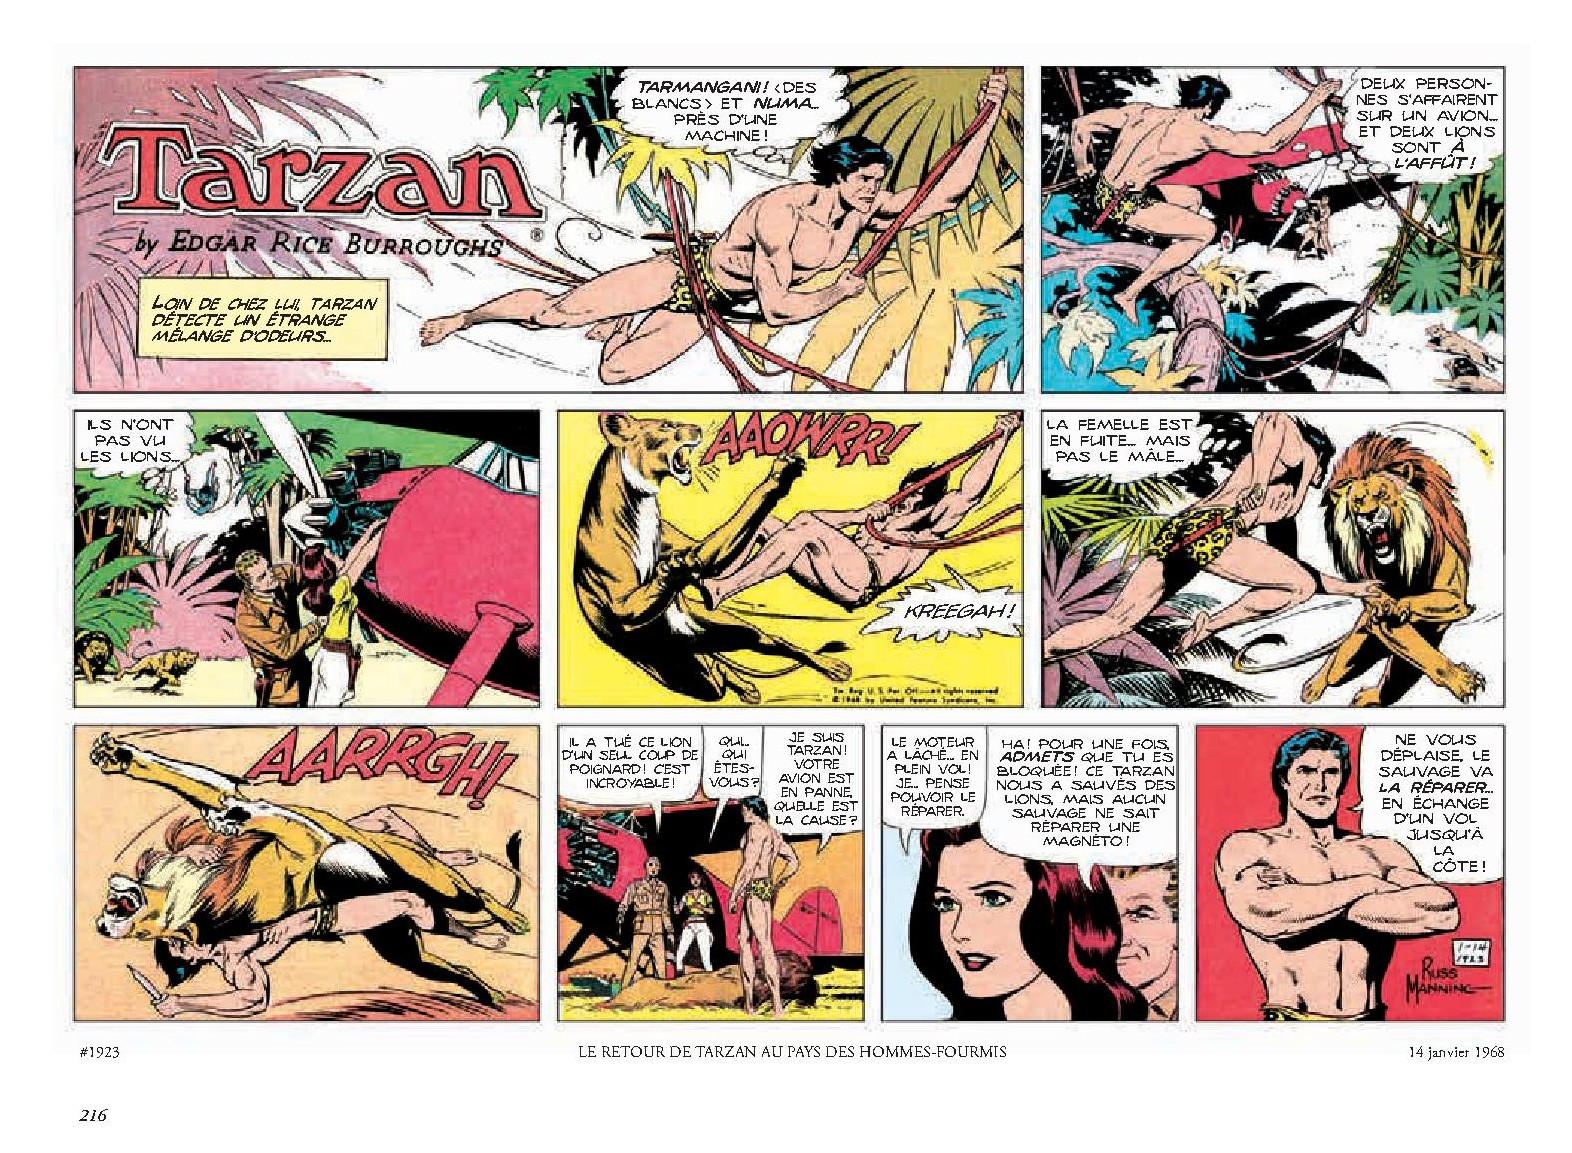 Tarzan _ intégrale Russ Manning newspaper strips _ Tome 1, 1967-1969-4